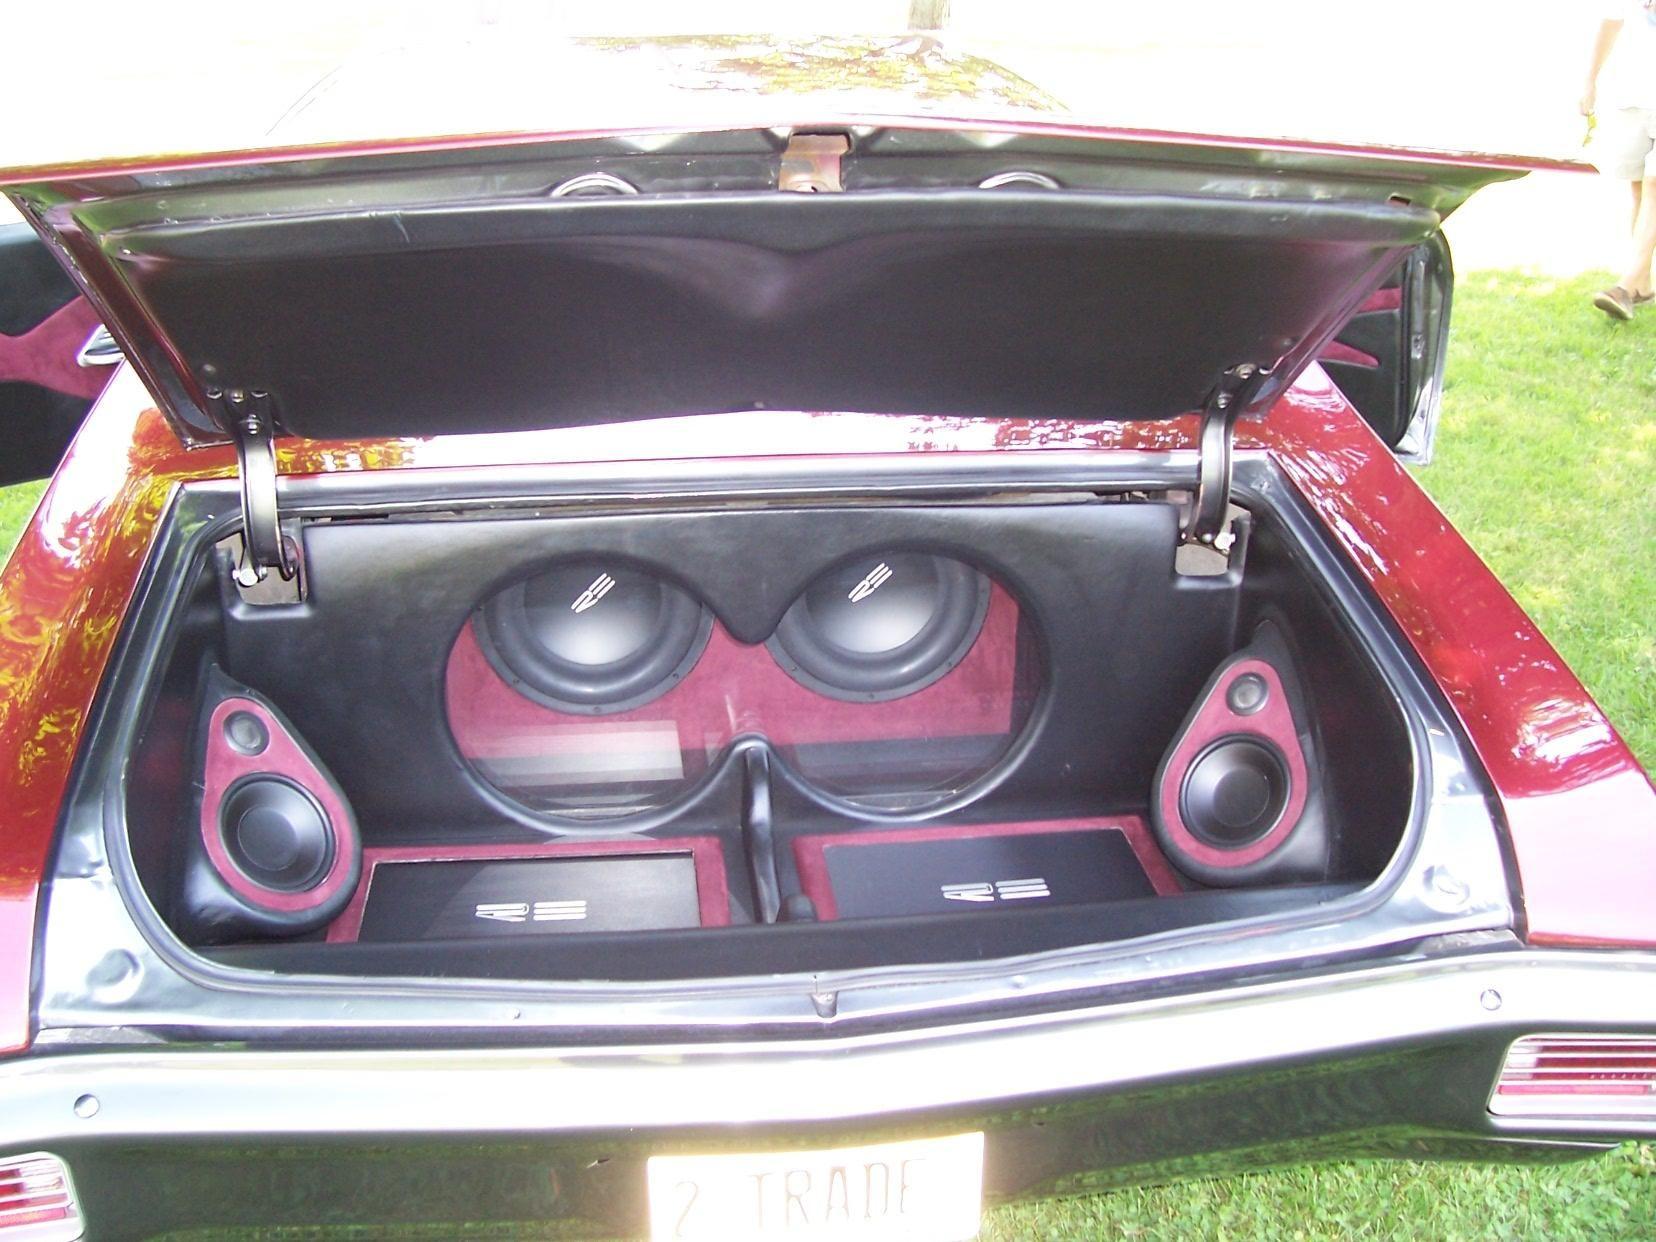 medium resolution of 70 chevelle car audio install re audio fiberglass trunk plexiglass window subwoofers subs